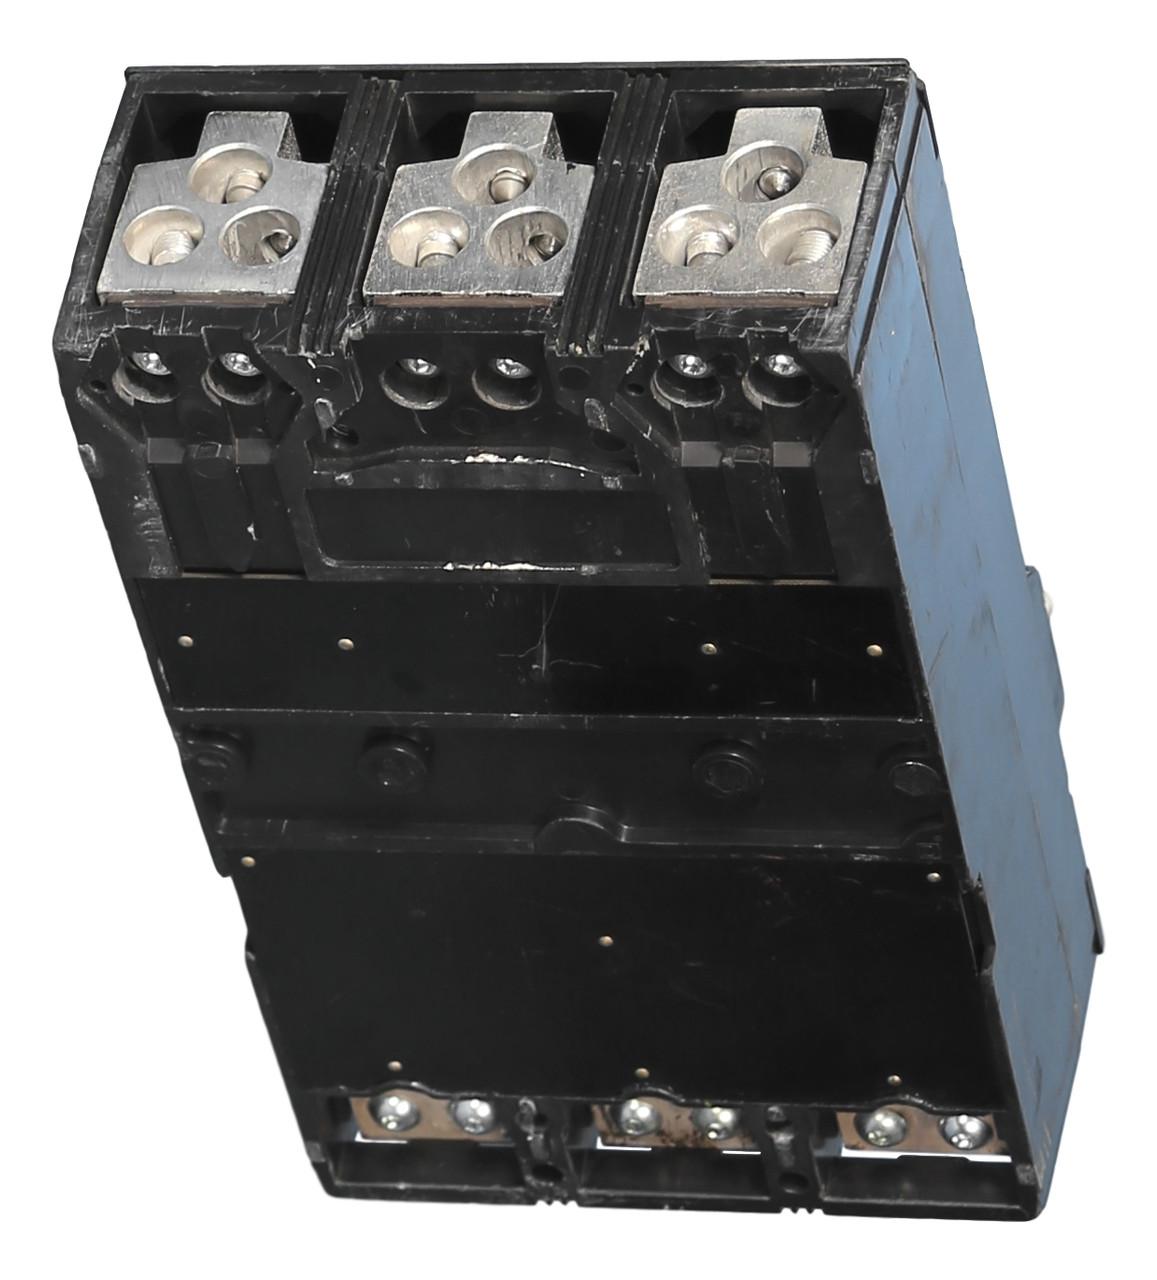 MEL36800 w/Adjustable Ground View of backside